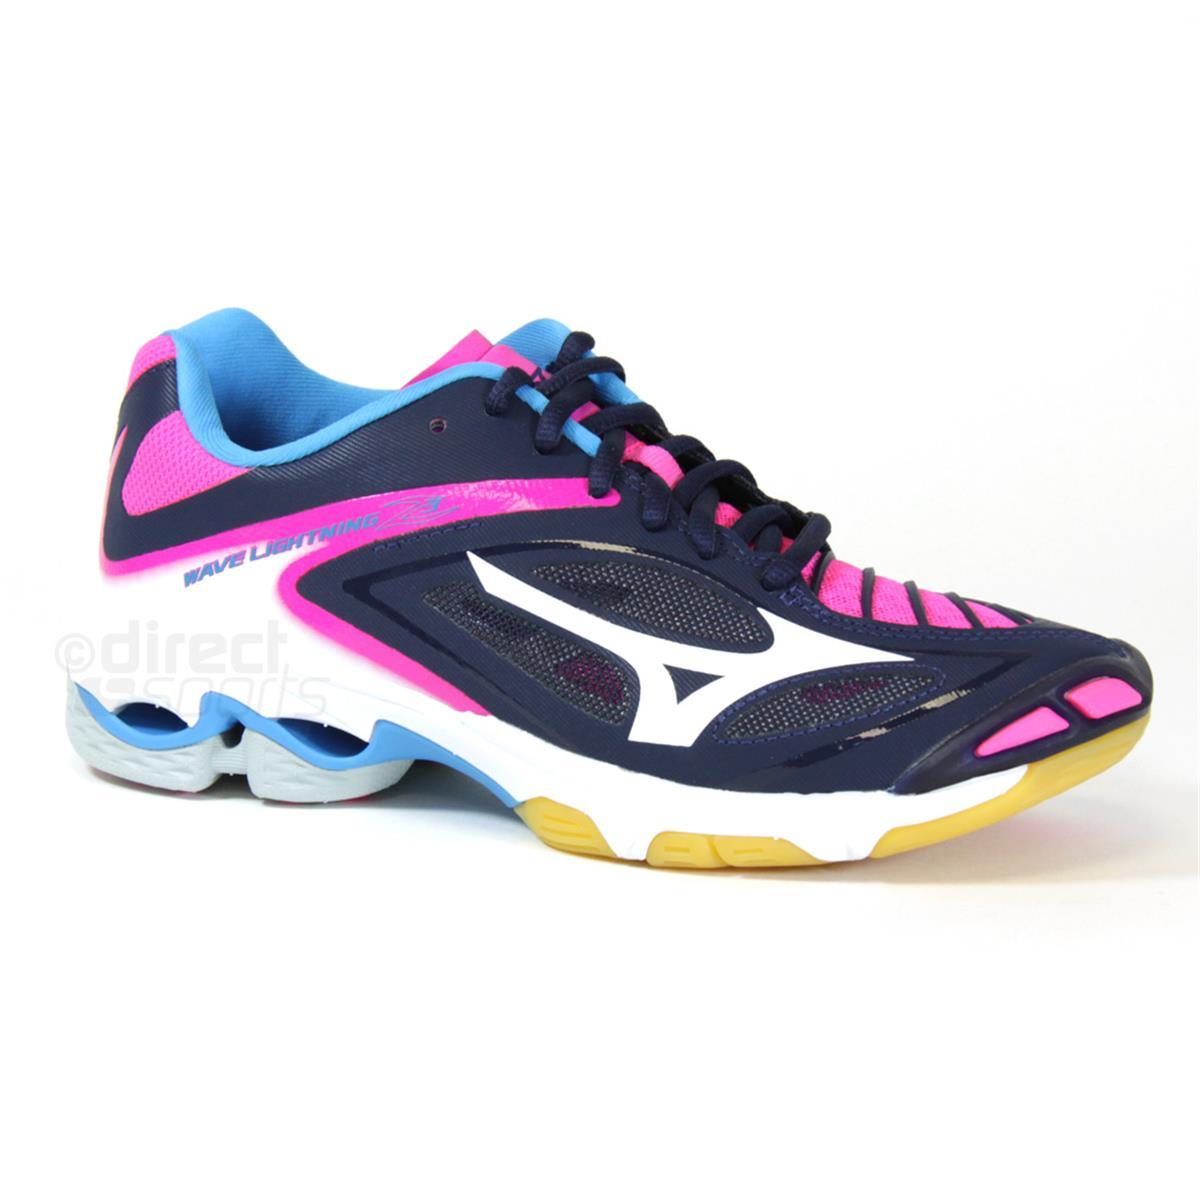 7dfc7f18b536 Mizuno Wave Lightning Z3 Womens Court Shoes (Peatcoat-Pink Glow ...